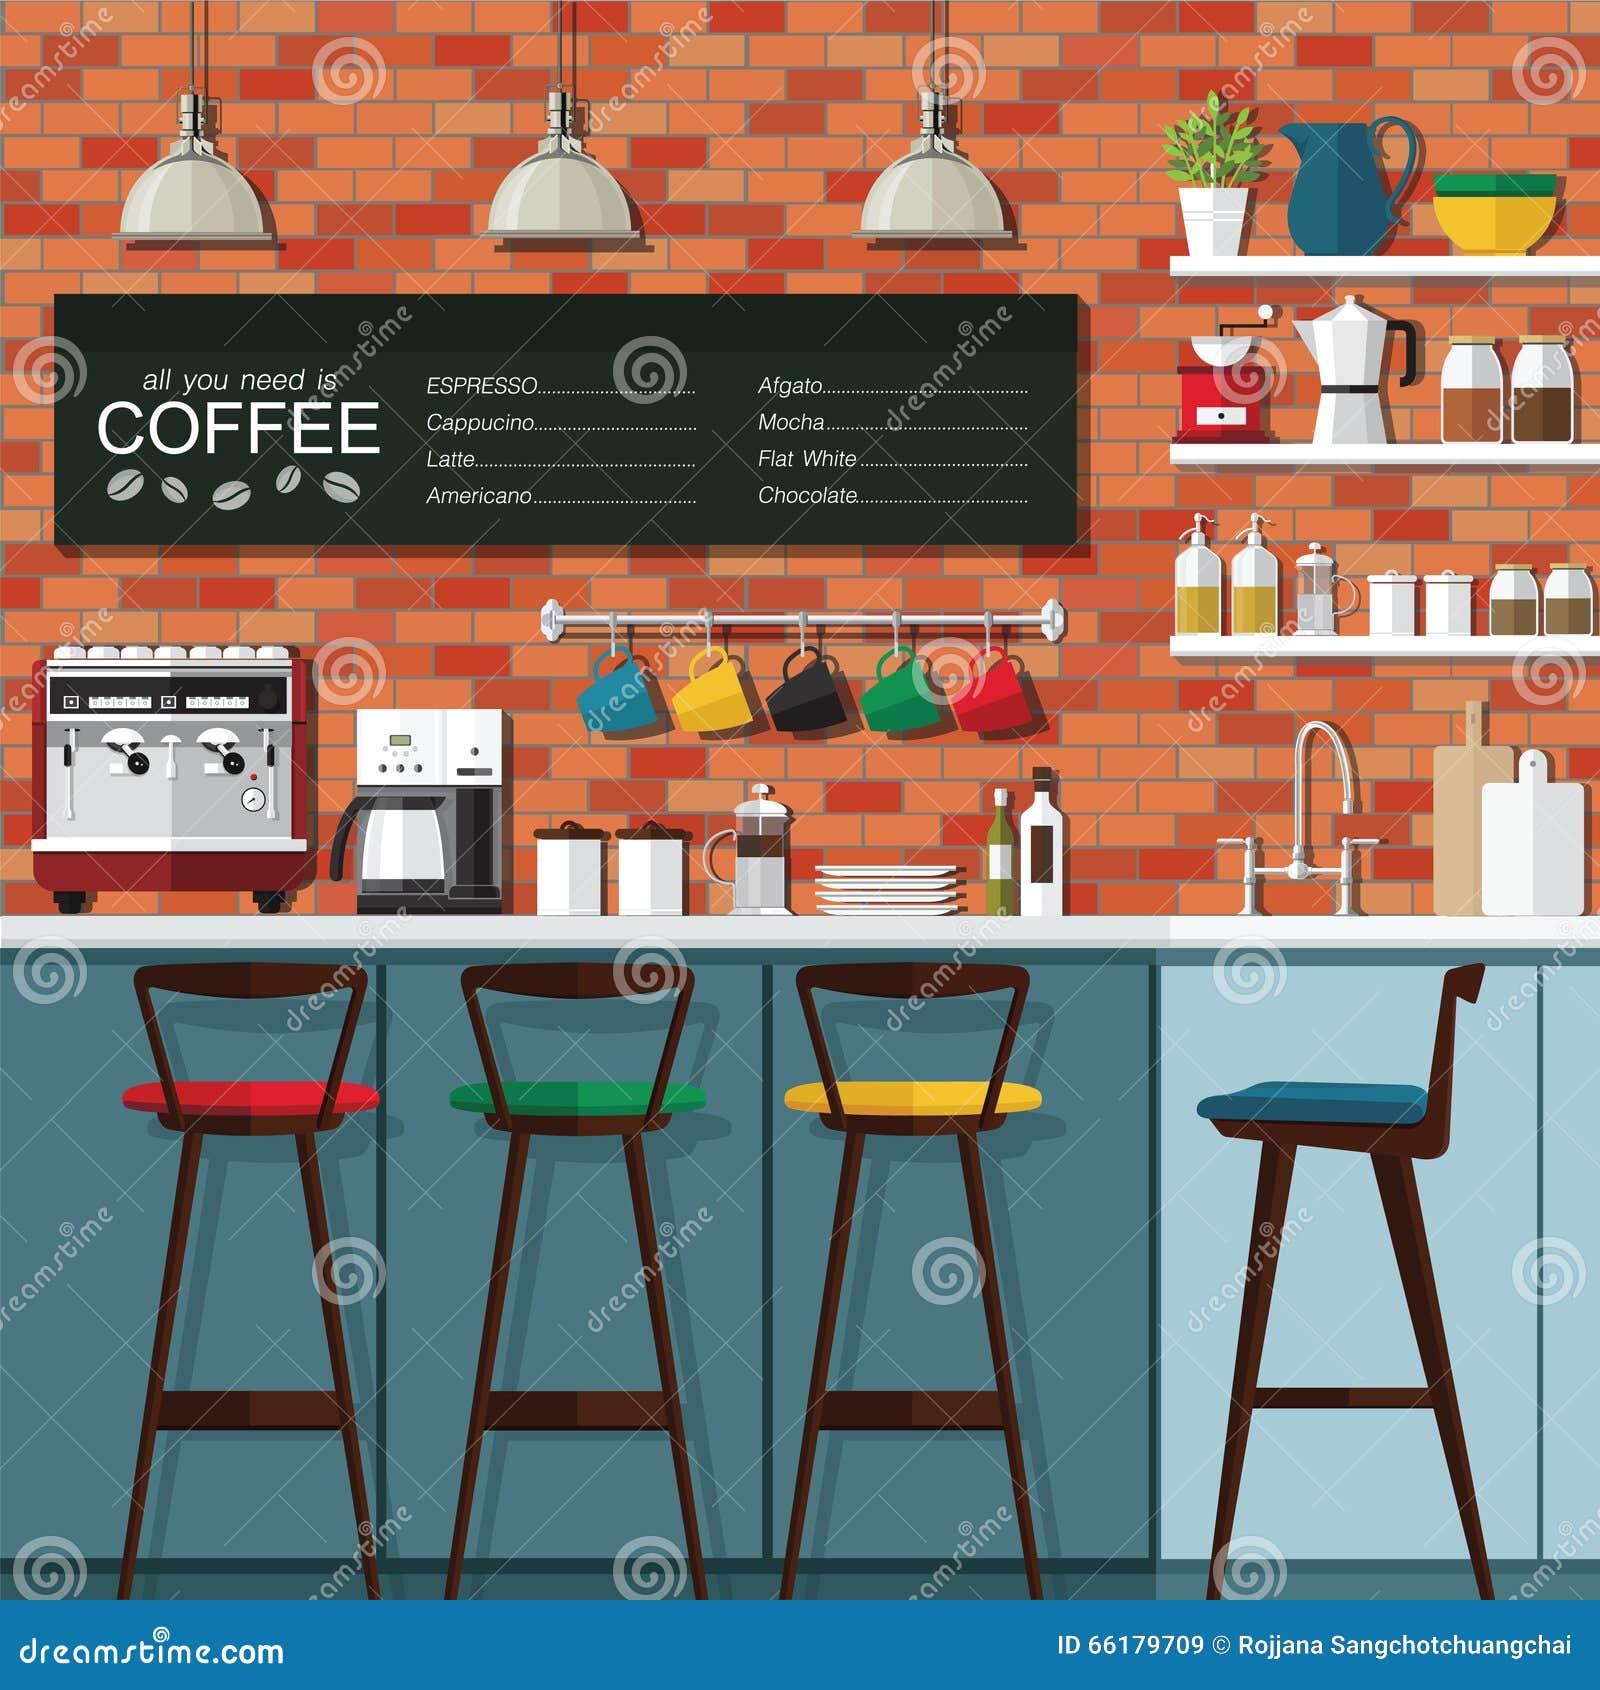 Coffee bar design stock vector illustration of indoor for Modern coffee bar design